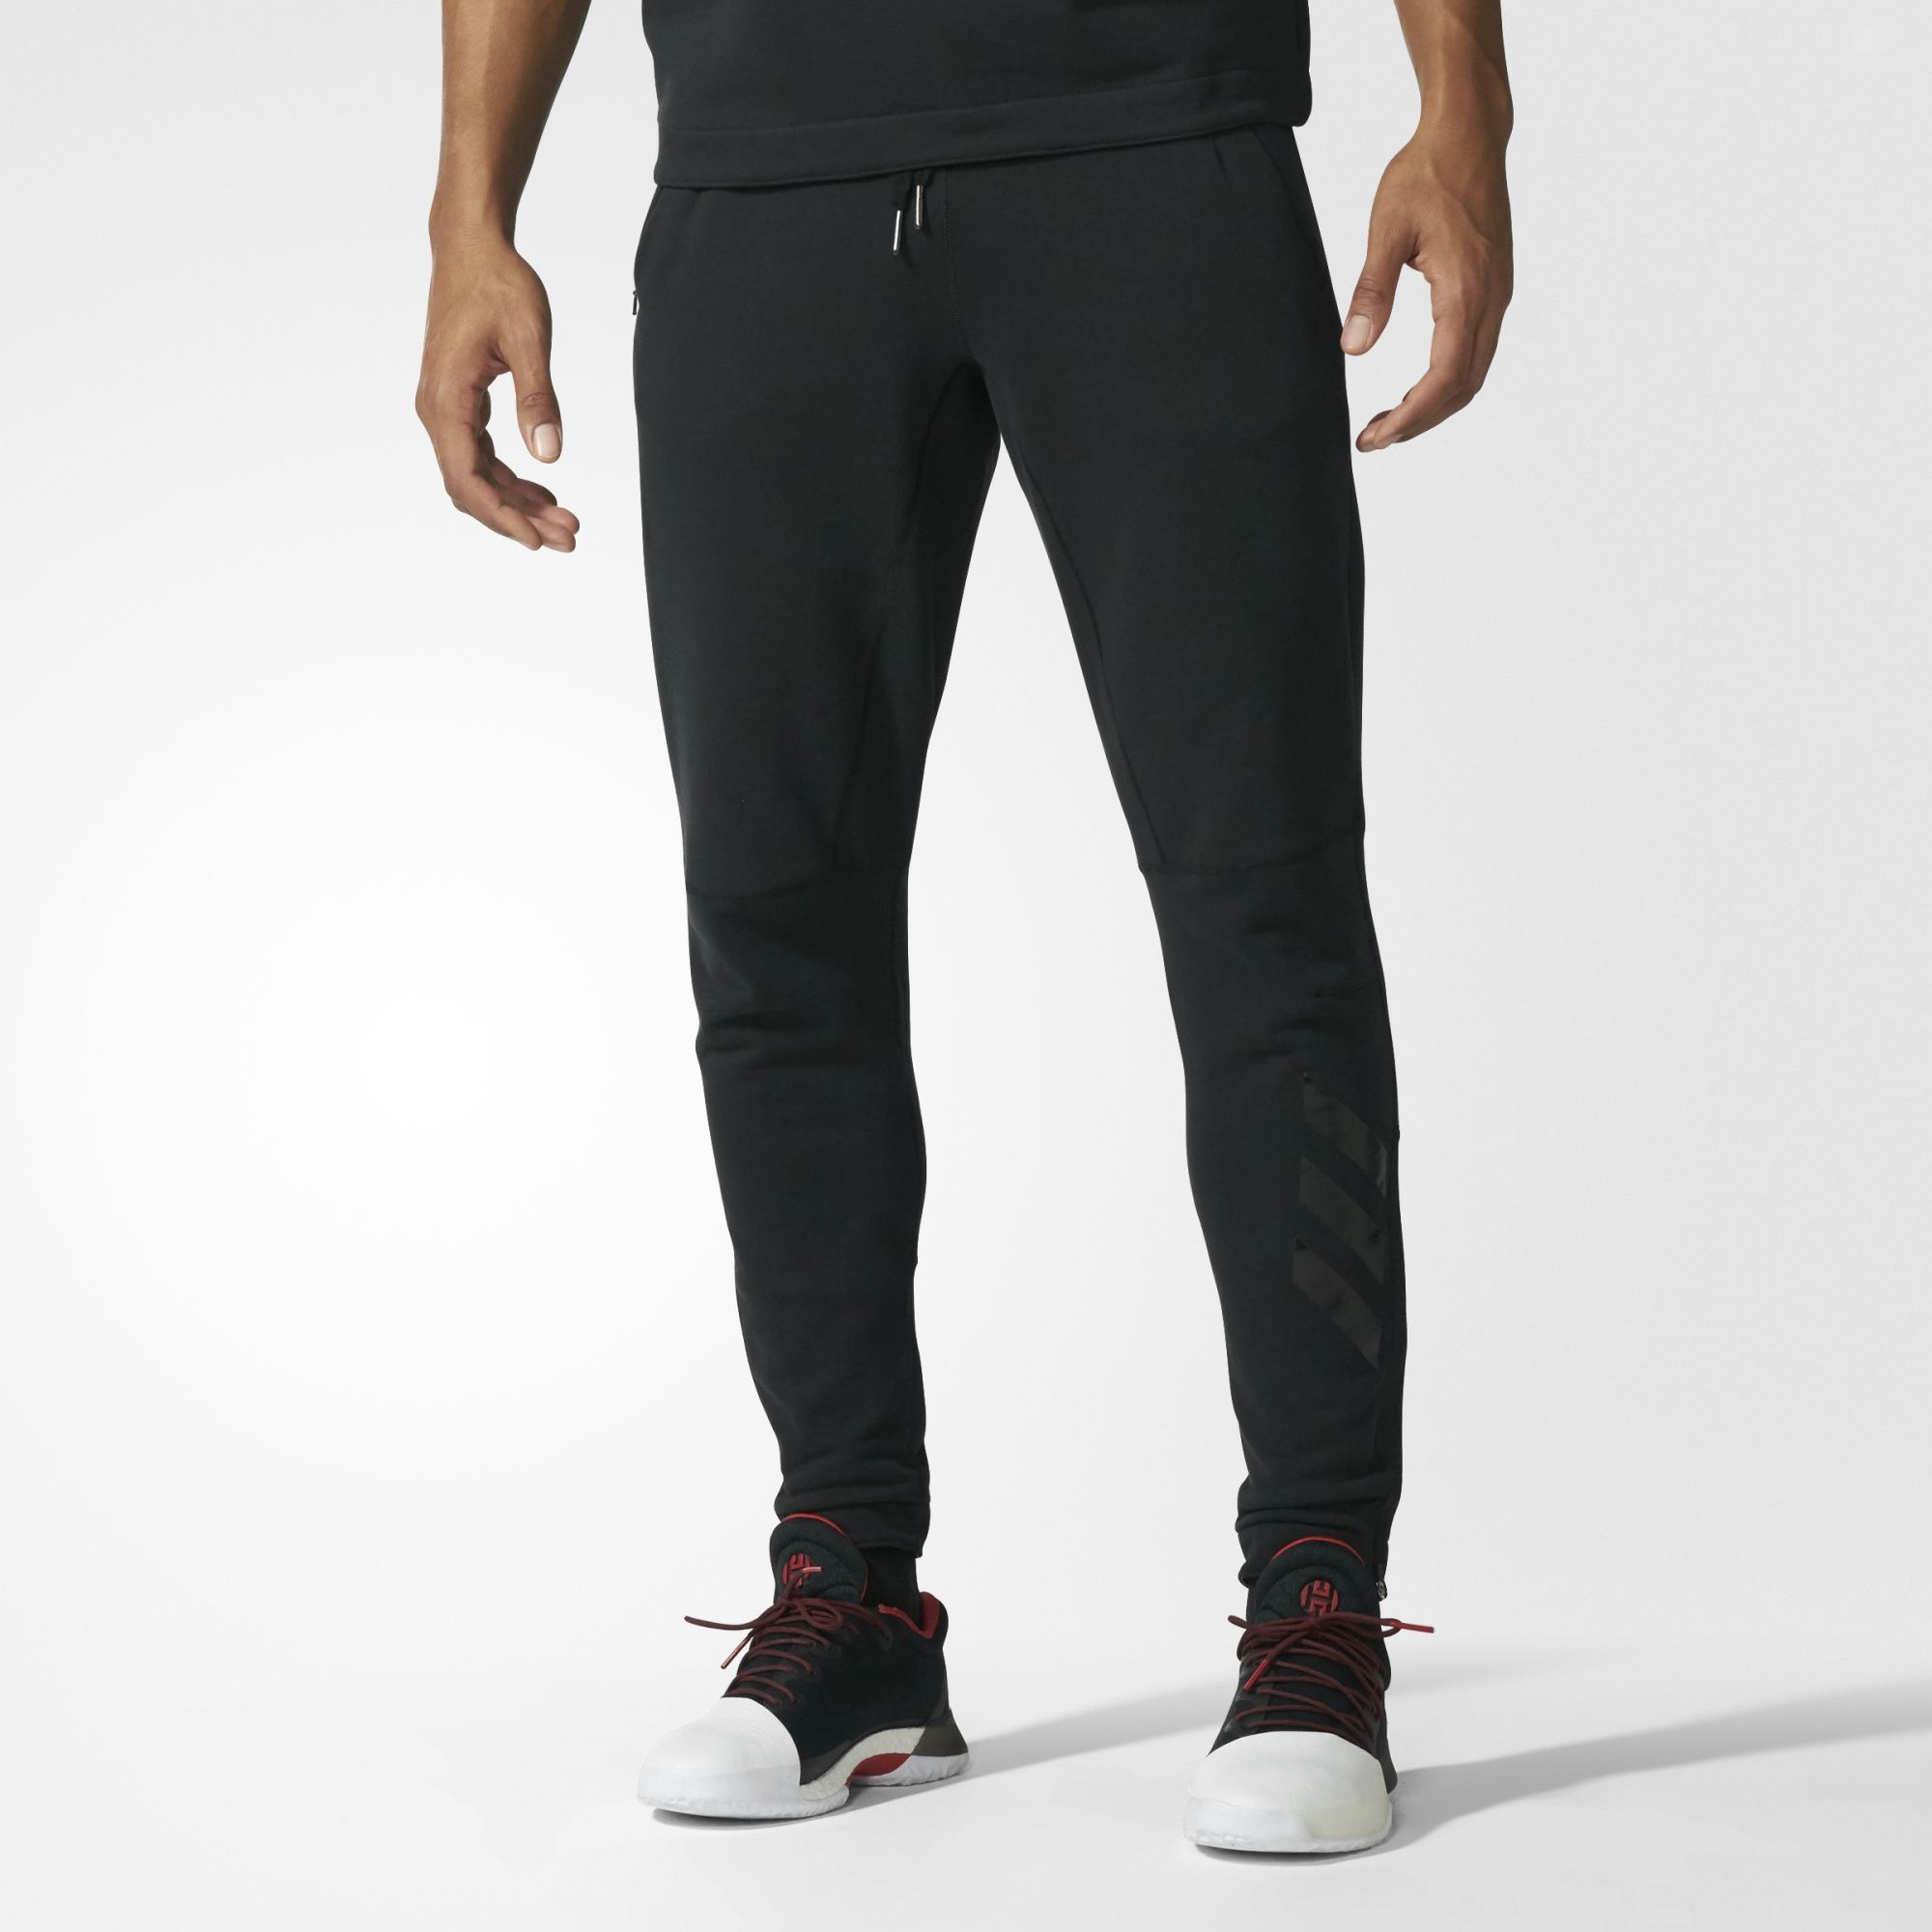 adidas Men's Harden Vol. 1 MVP Sweat Pants | Mens athletic